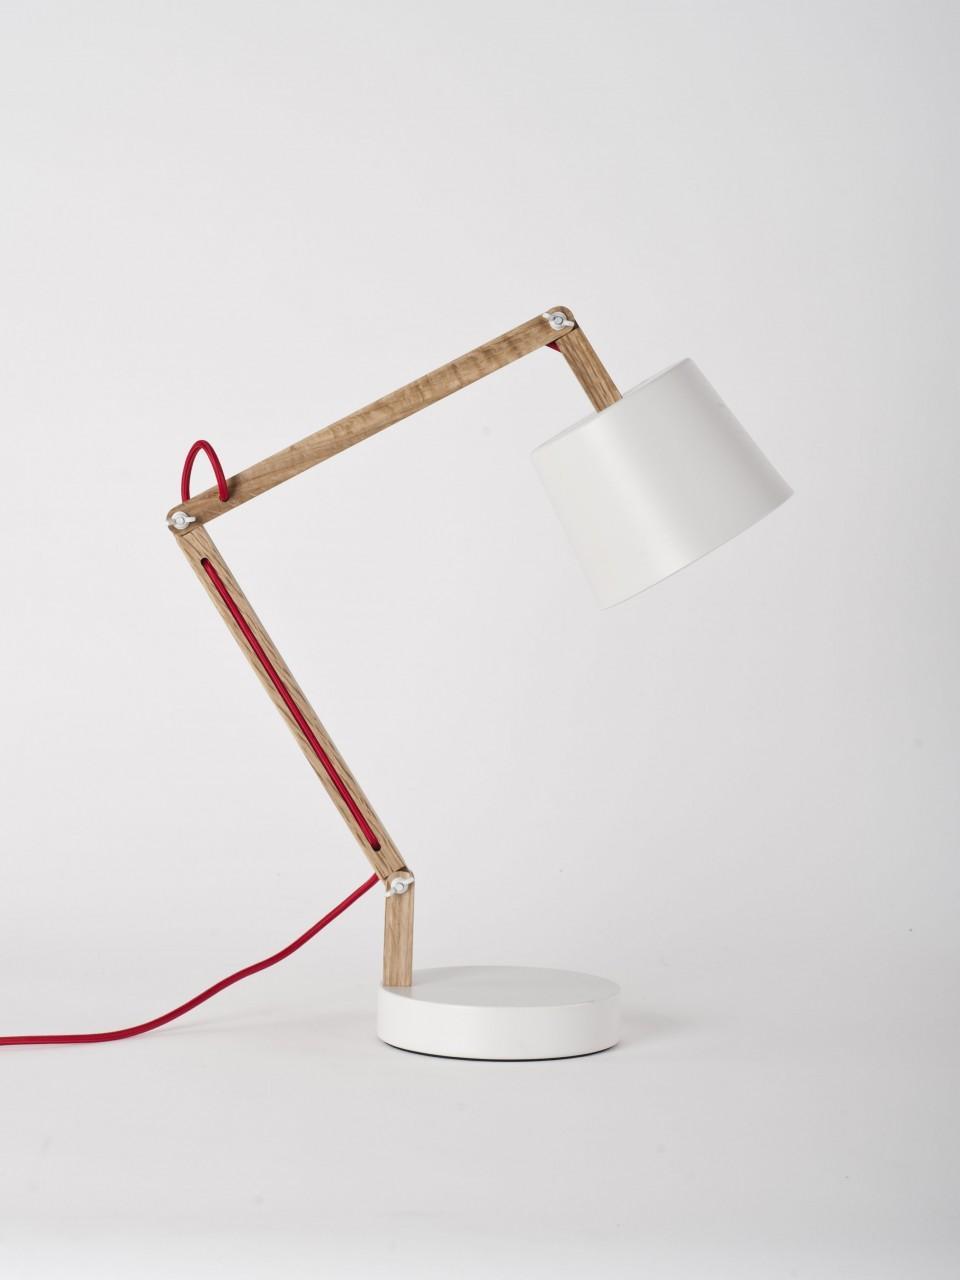 White Angle Table Lamp 2.0 - Douglas + Bec